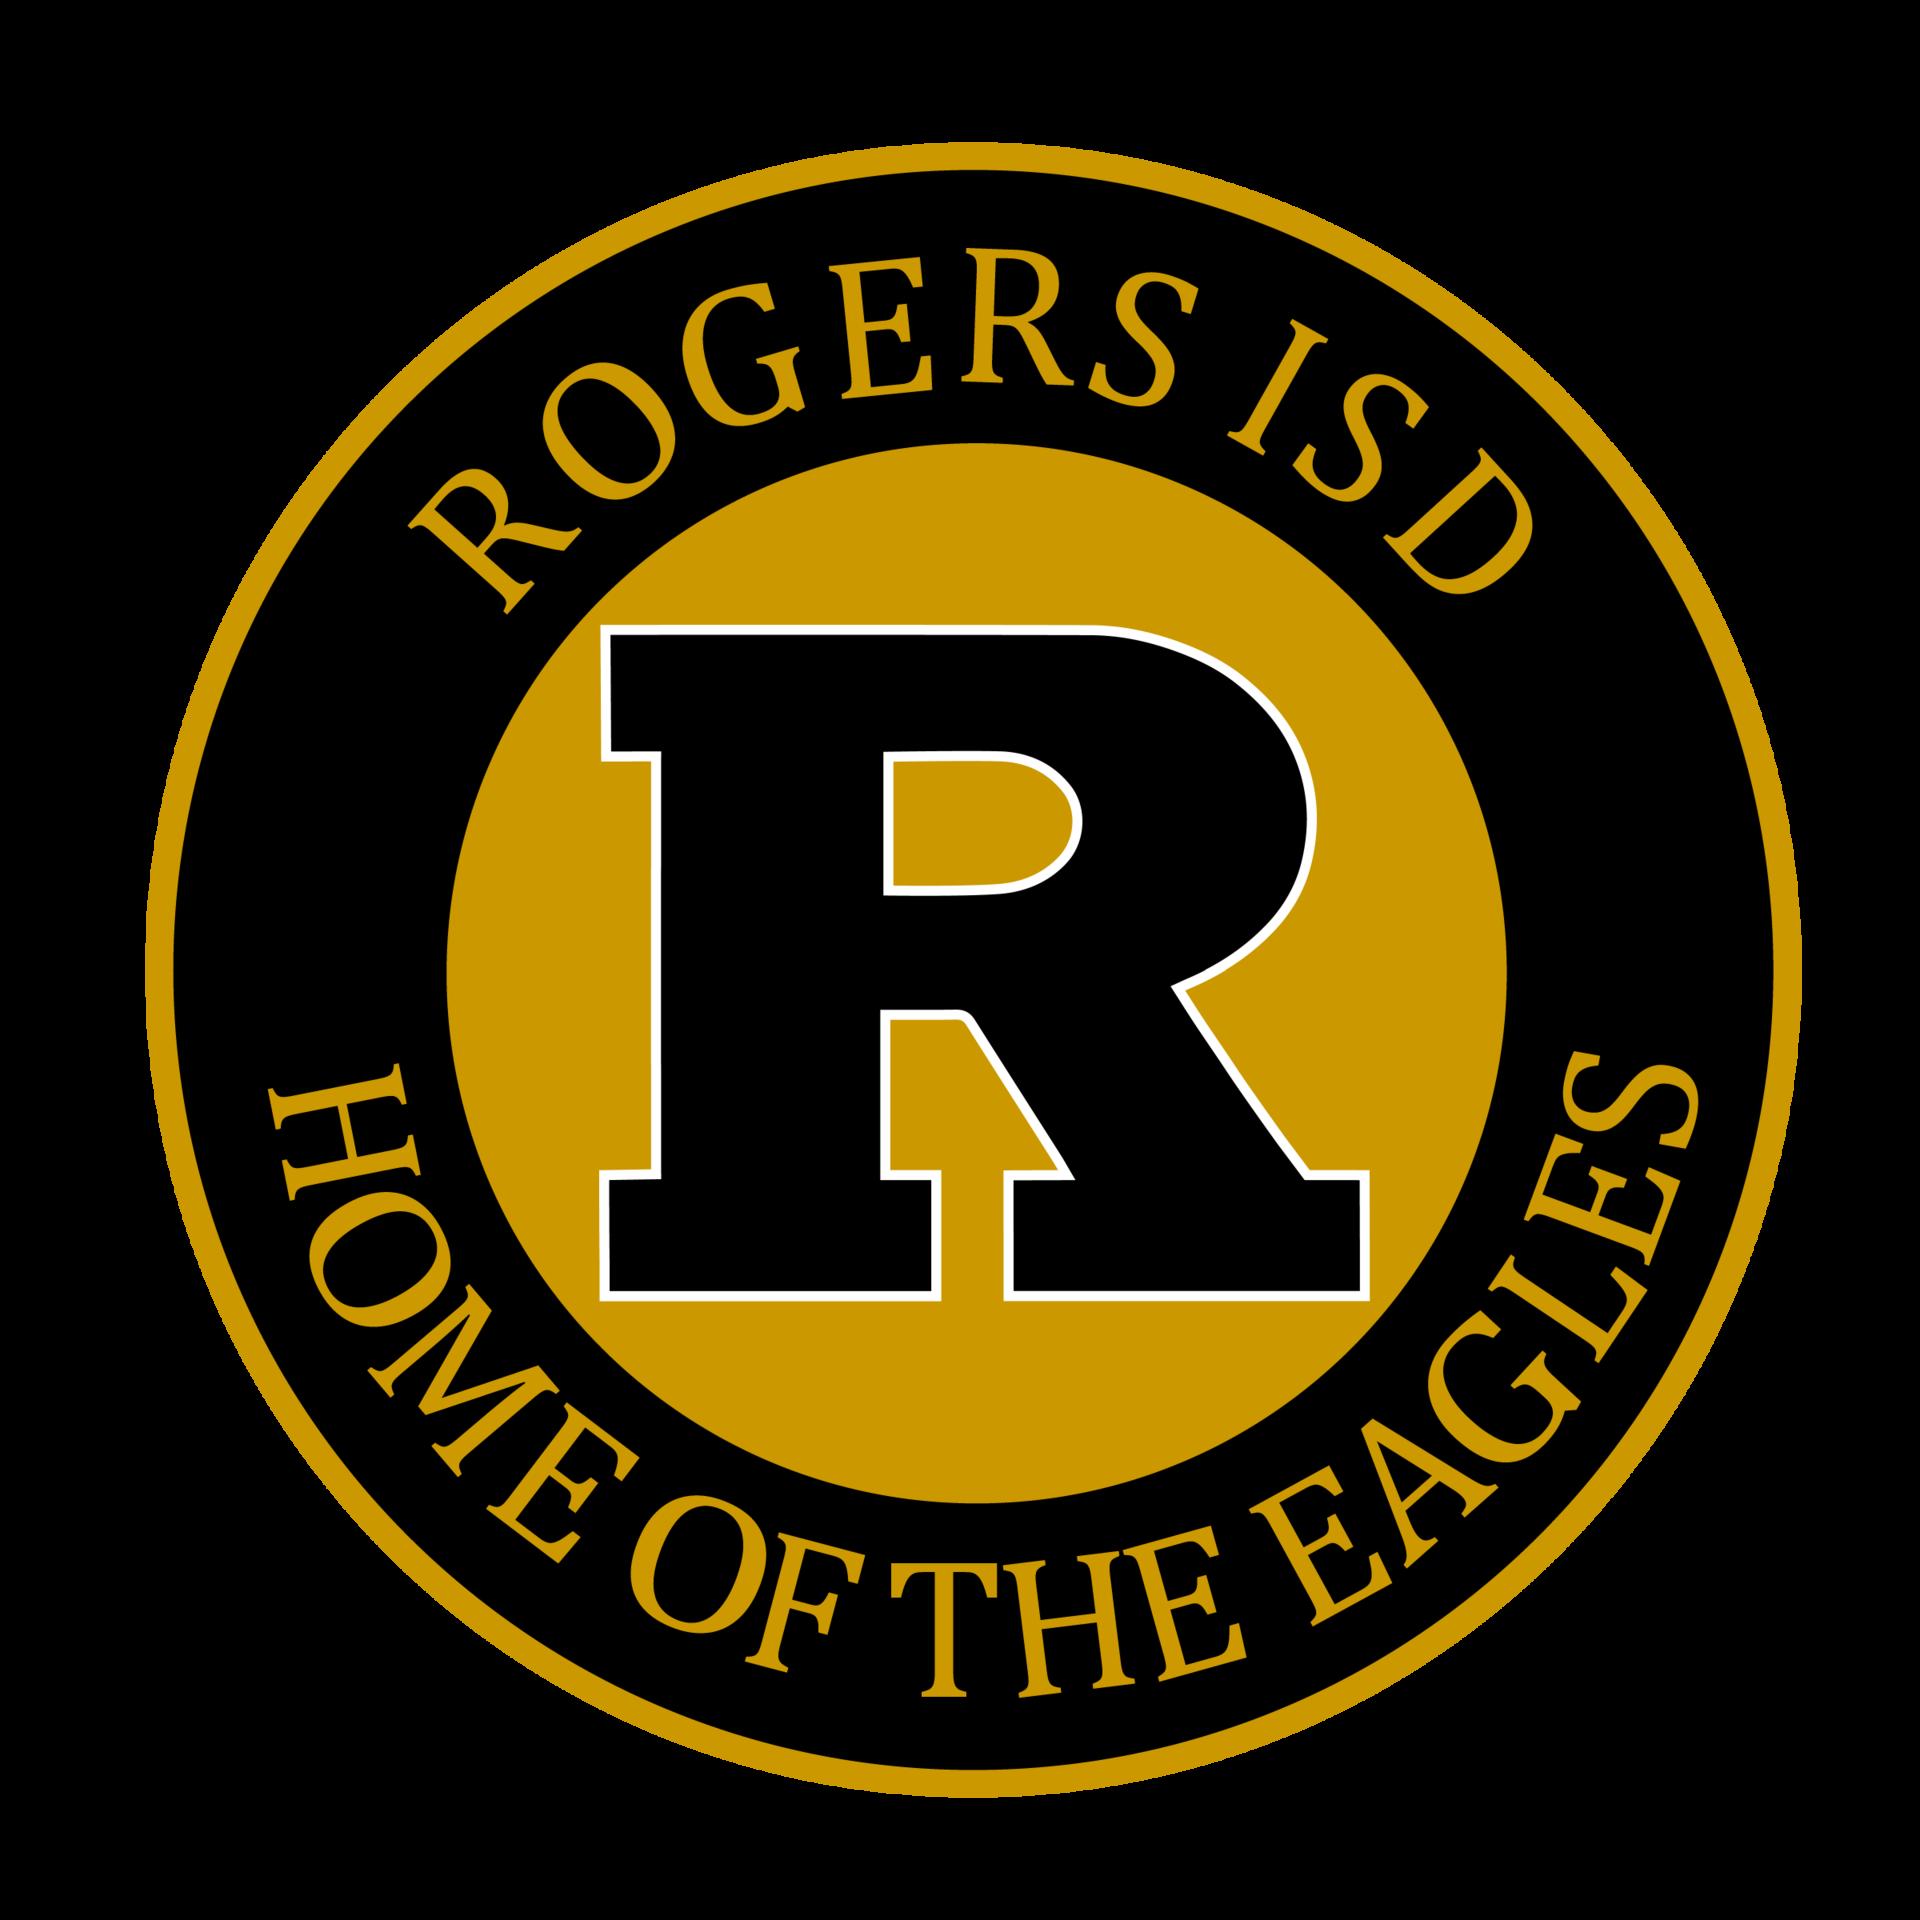 Rogers ISD logo